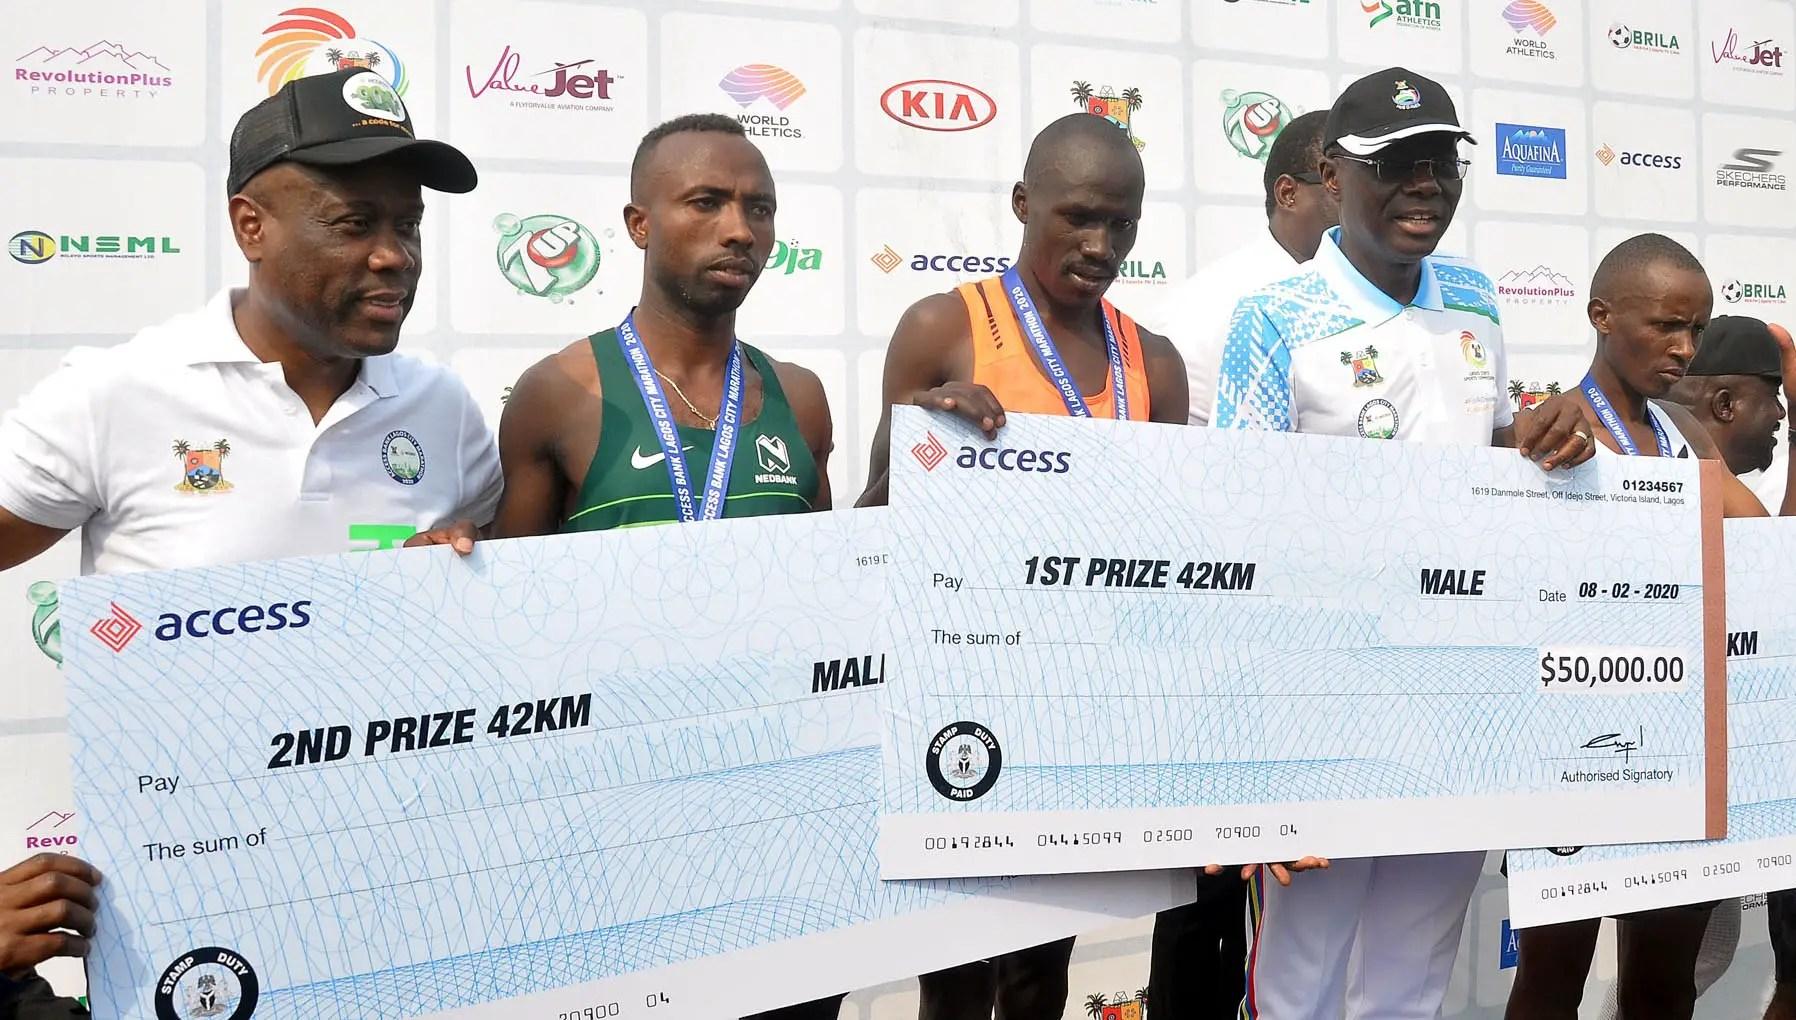 Access Bank Lagos City Marathon: Kenya's Tumor, Cherop Win With New Records